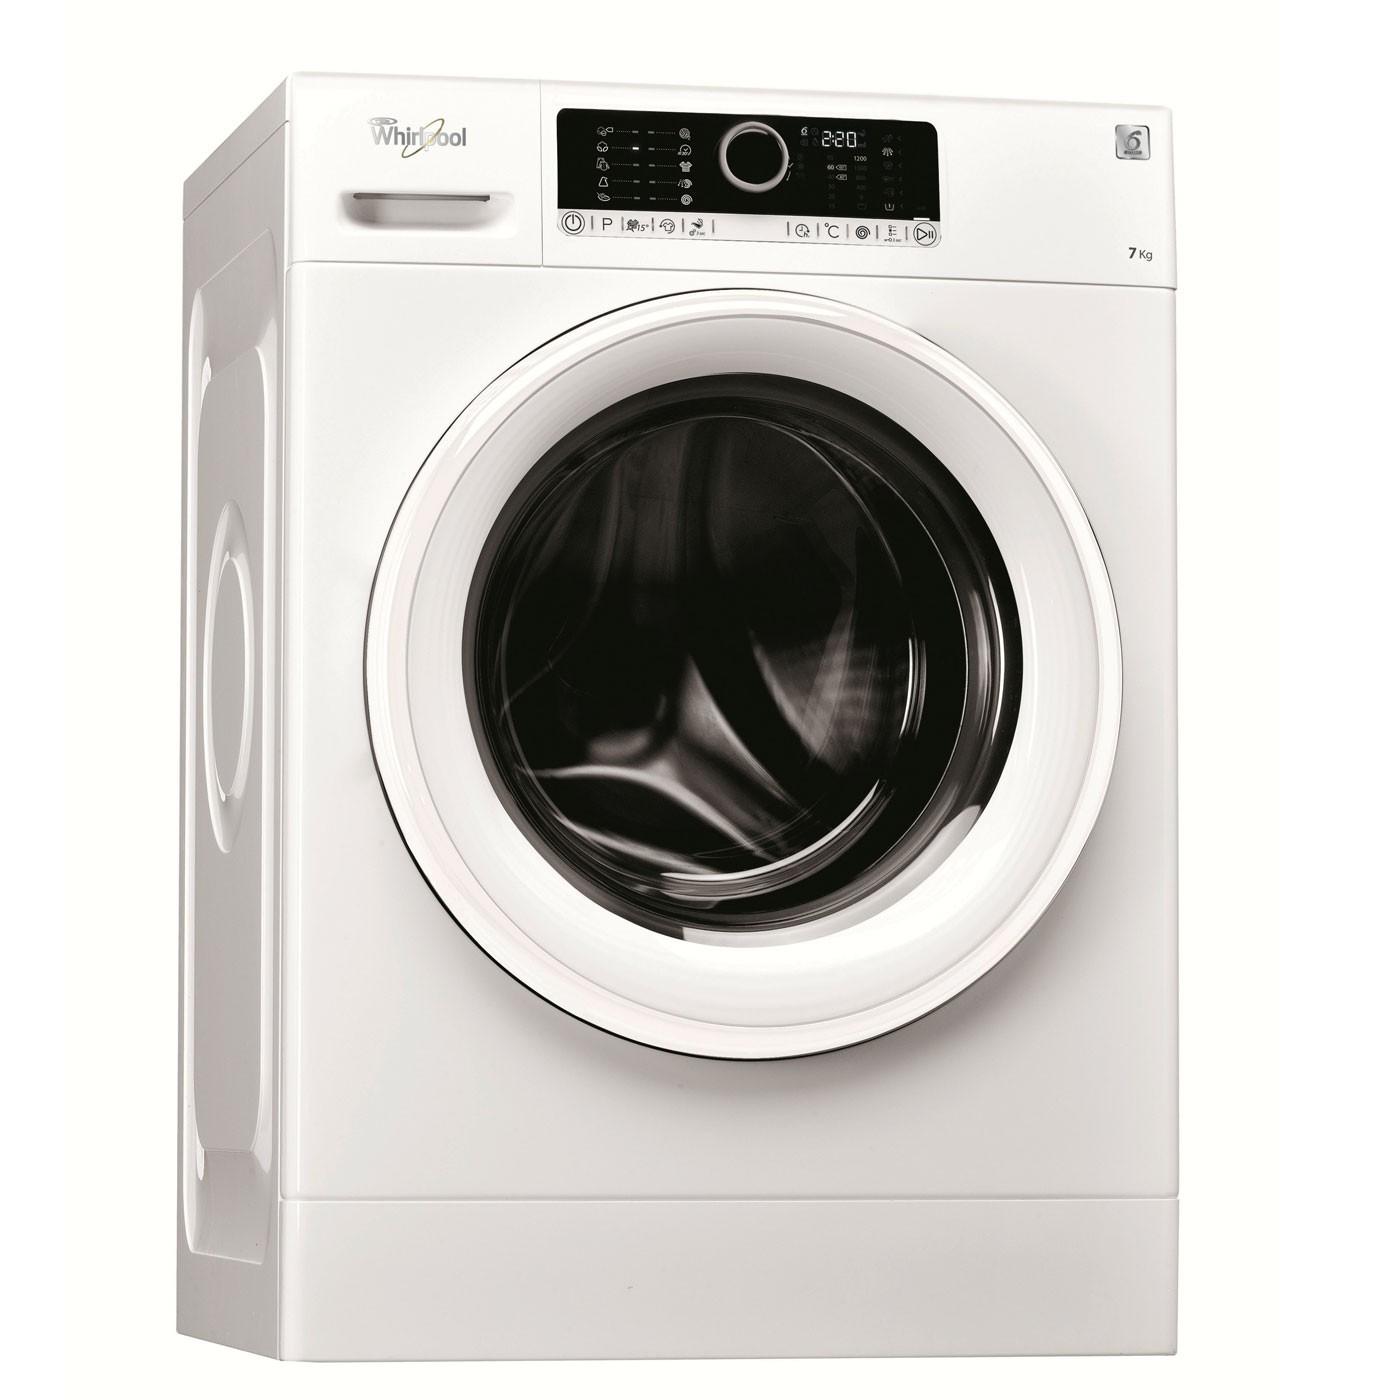 dedeman masina de spalat rufe whirlpool fscr 70211. Black Bedroom Furniture Sets. Home Design Ideas